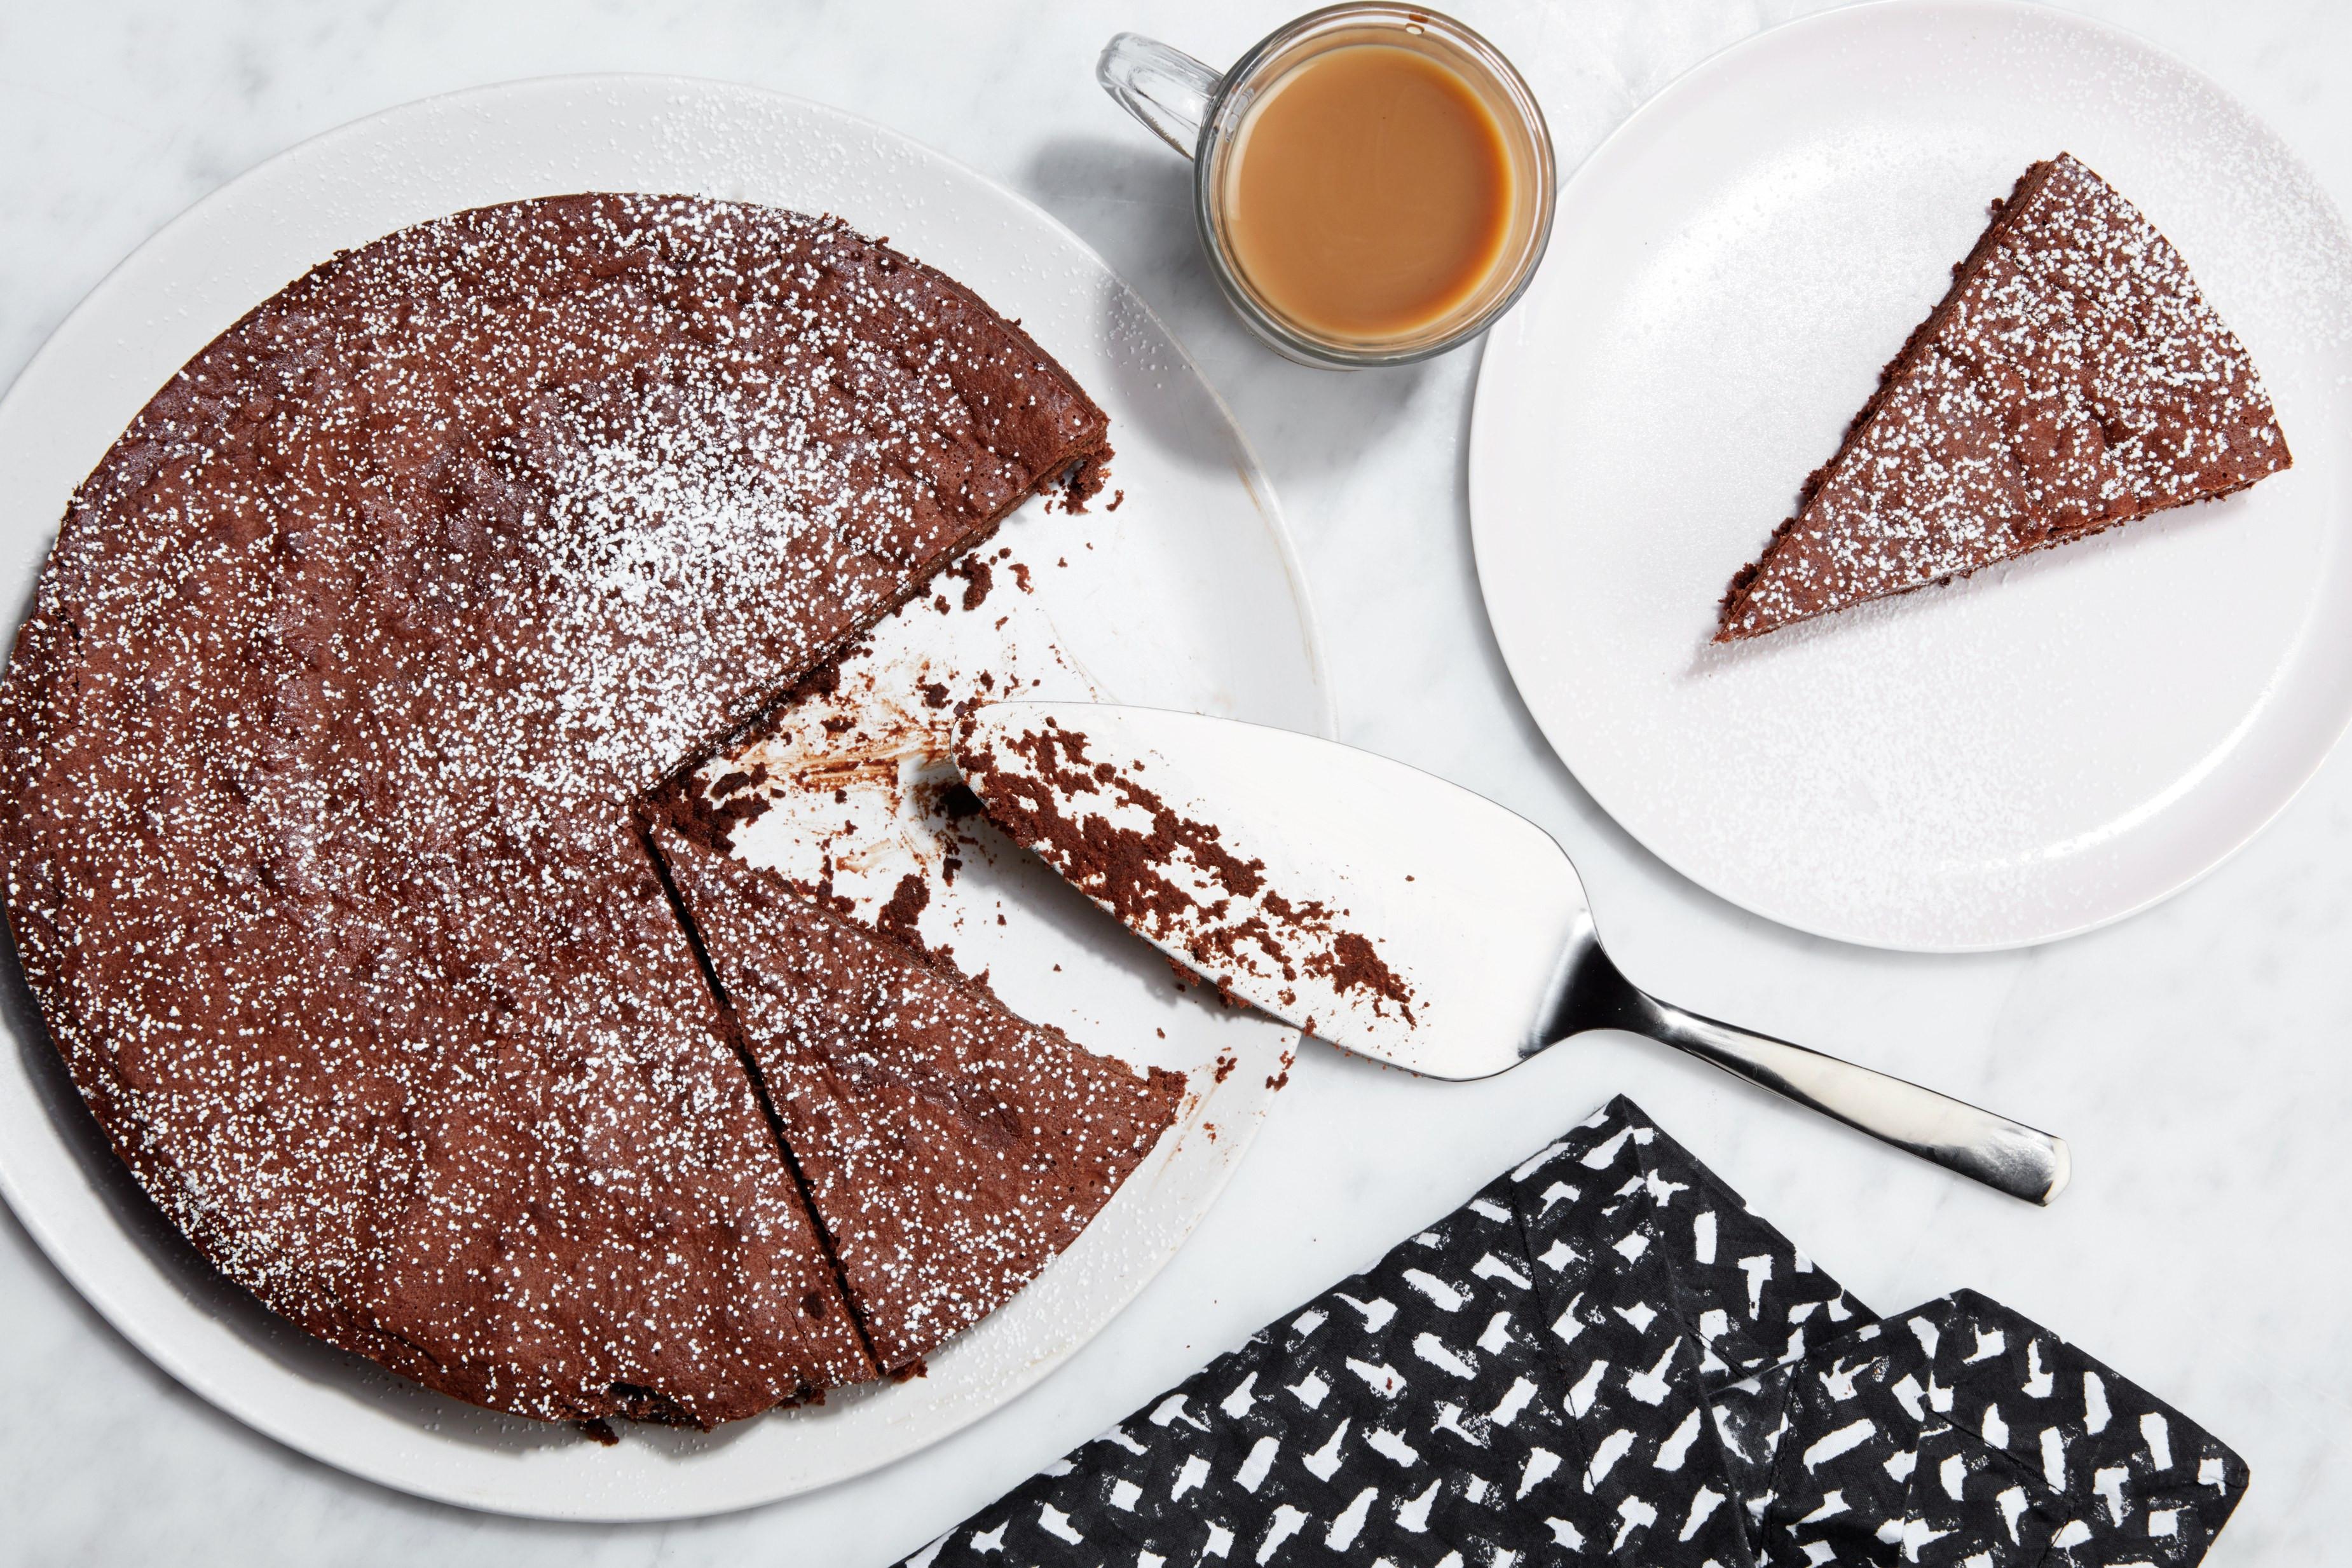 Chocolate Cake Ingredients  3 Ingre nt Flourless Chocolate Cake recipe